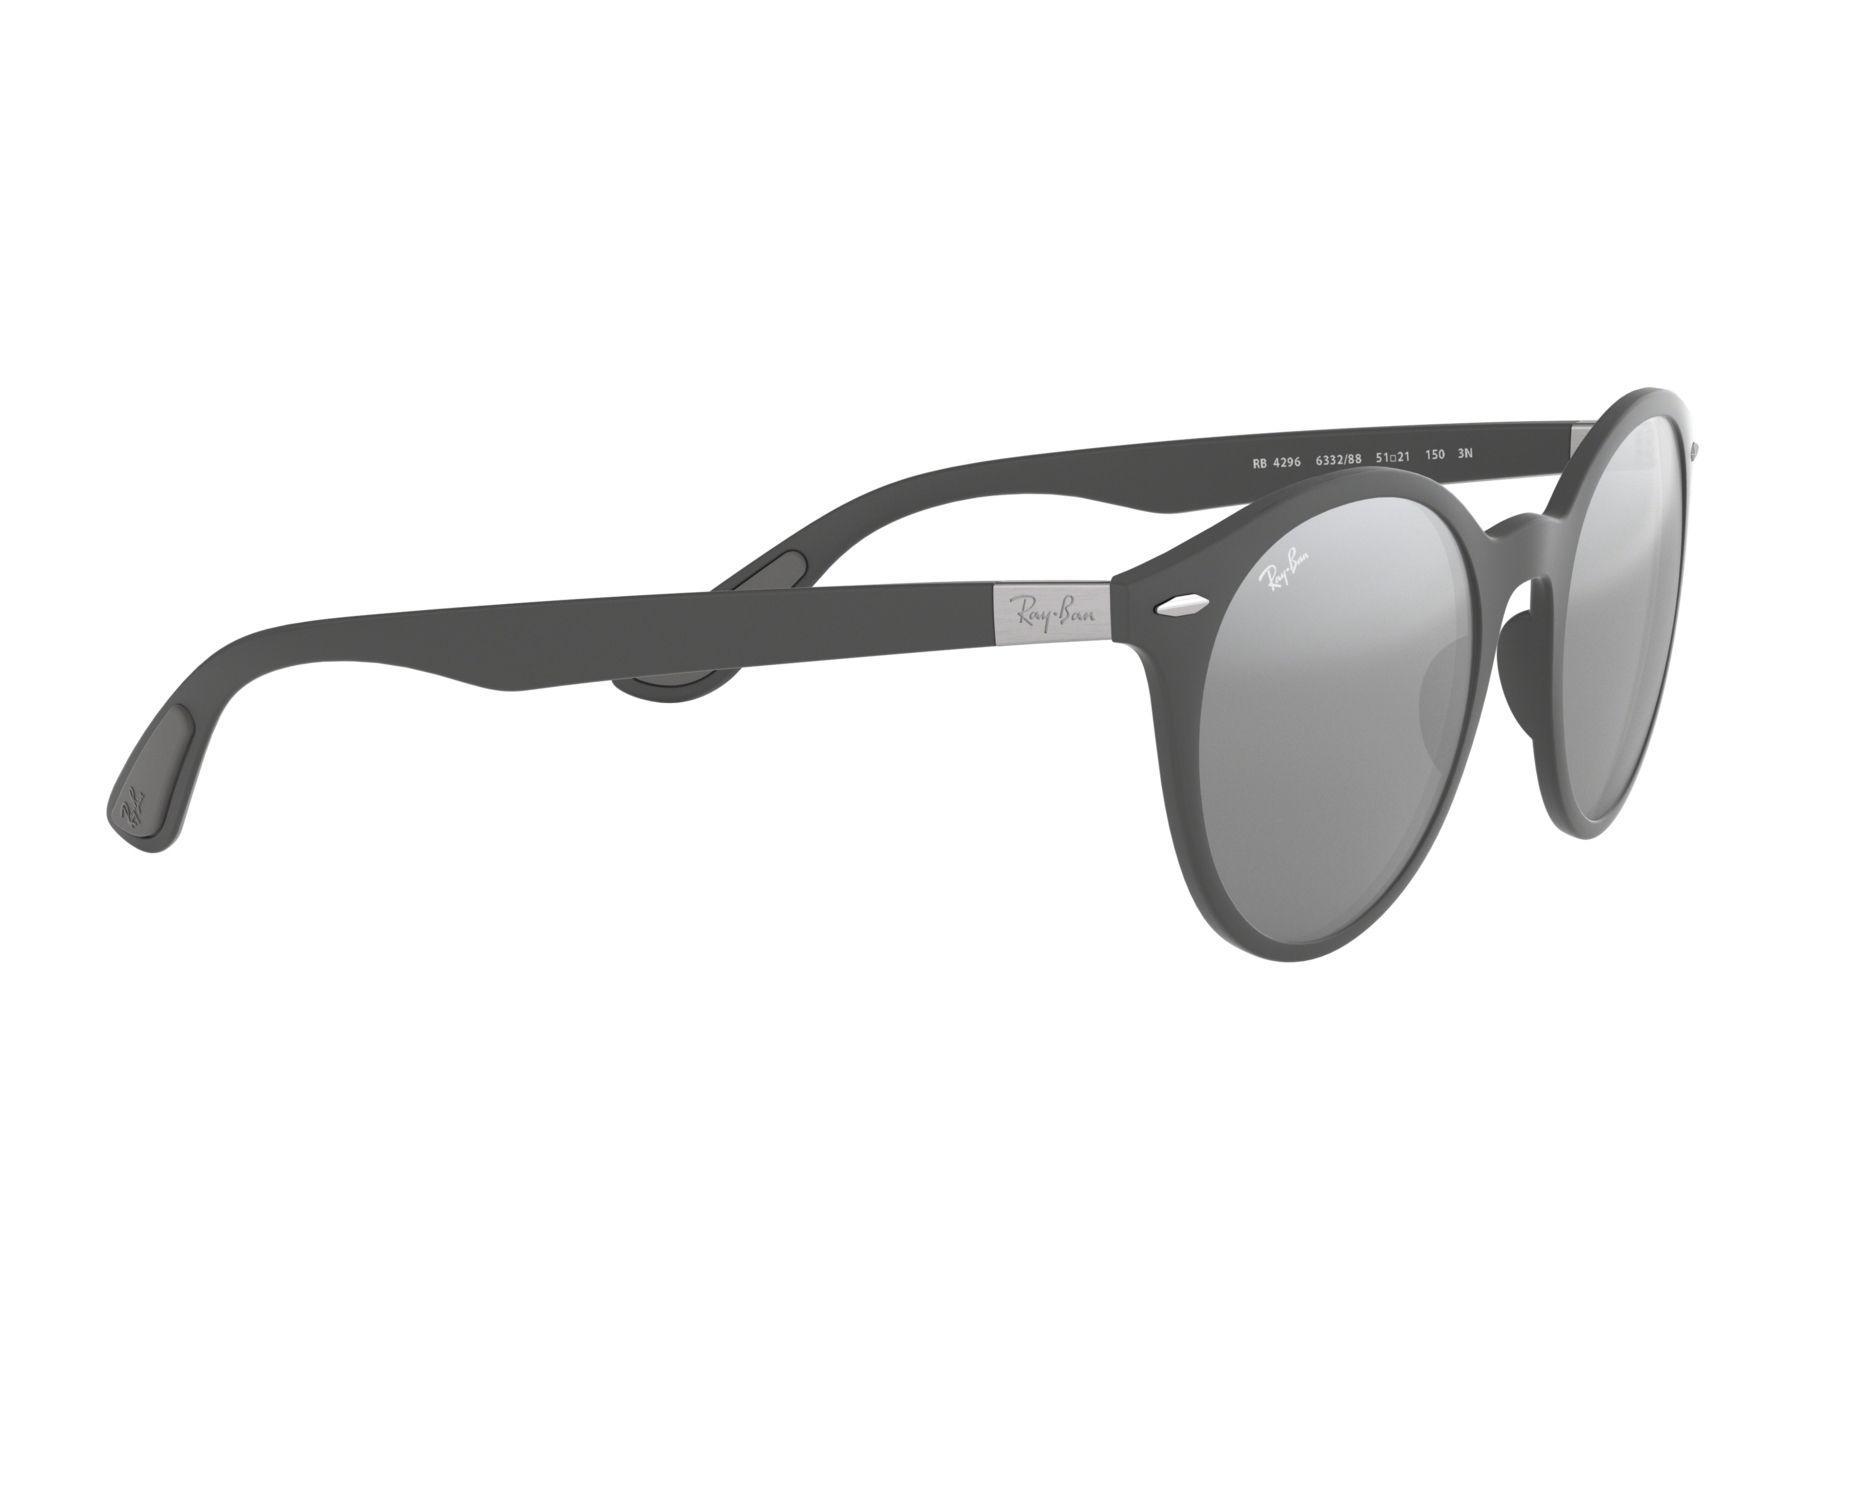 9470c13413 Sunglasses Ray-Ban RB-4296 633288 51-21 Grey 360 degree view 11